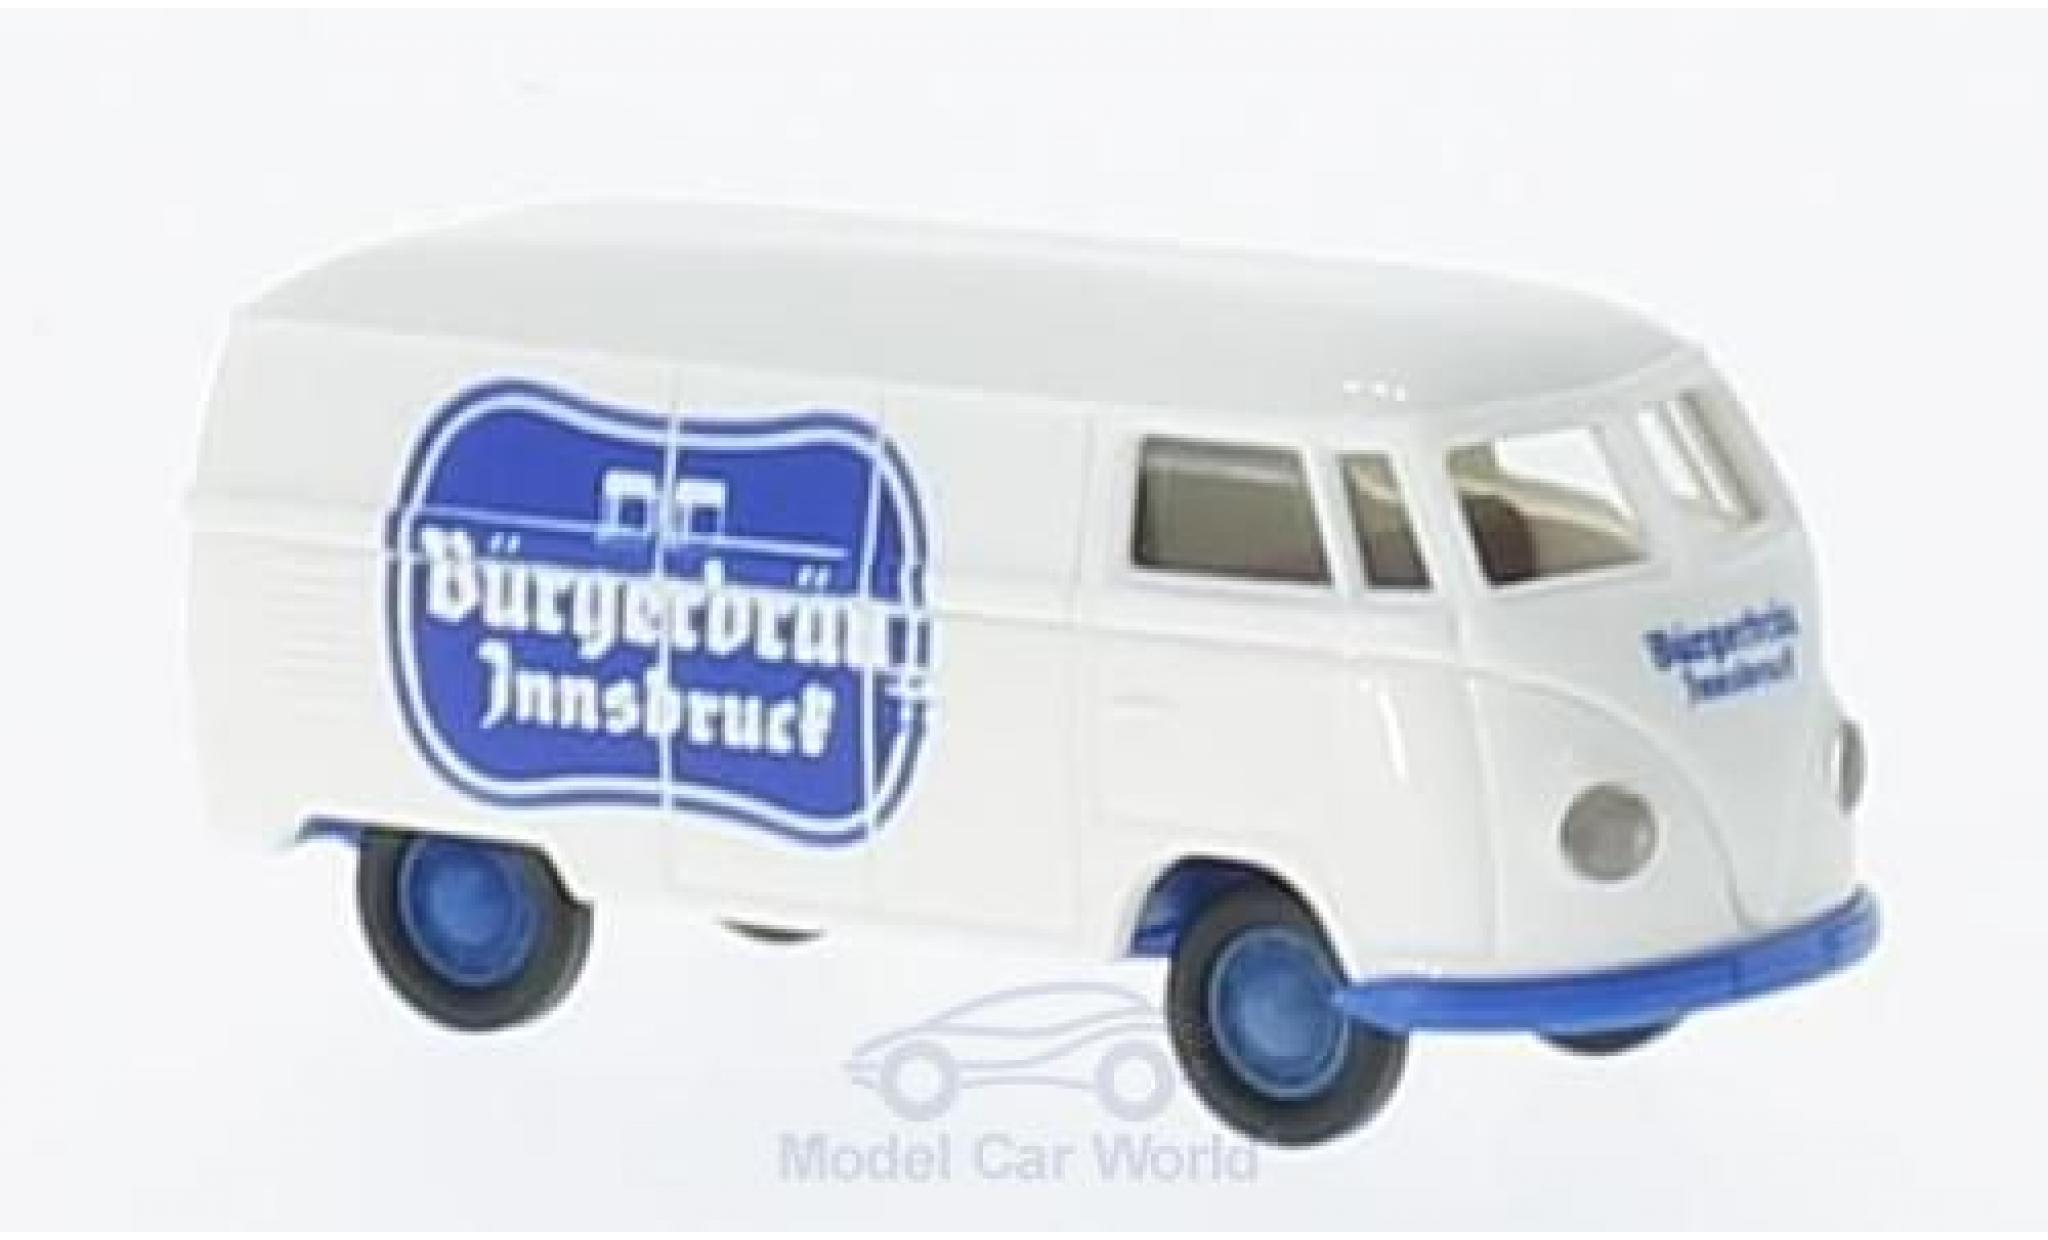 Volkswagen T1 B 1/87 Brekina a ürgerbräu Innsbruck Kasten